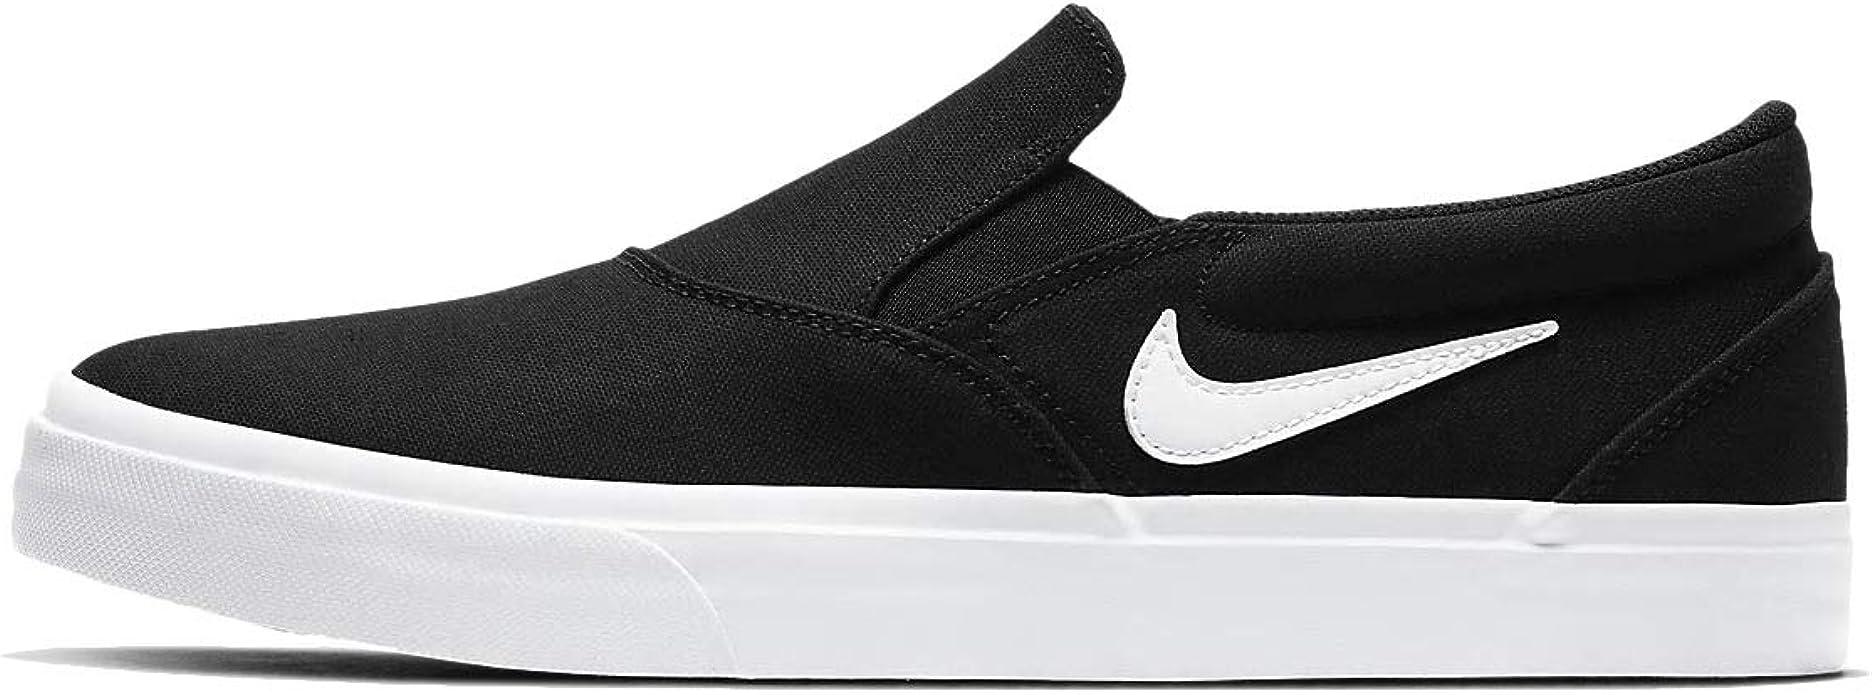 Nike Sb Charge Slip Skate Shoe Mens